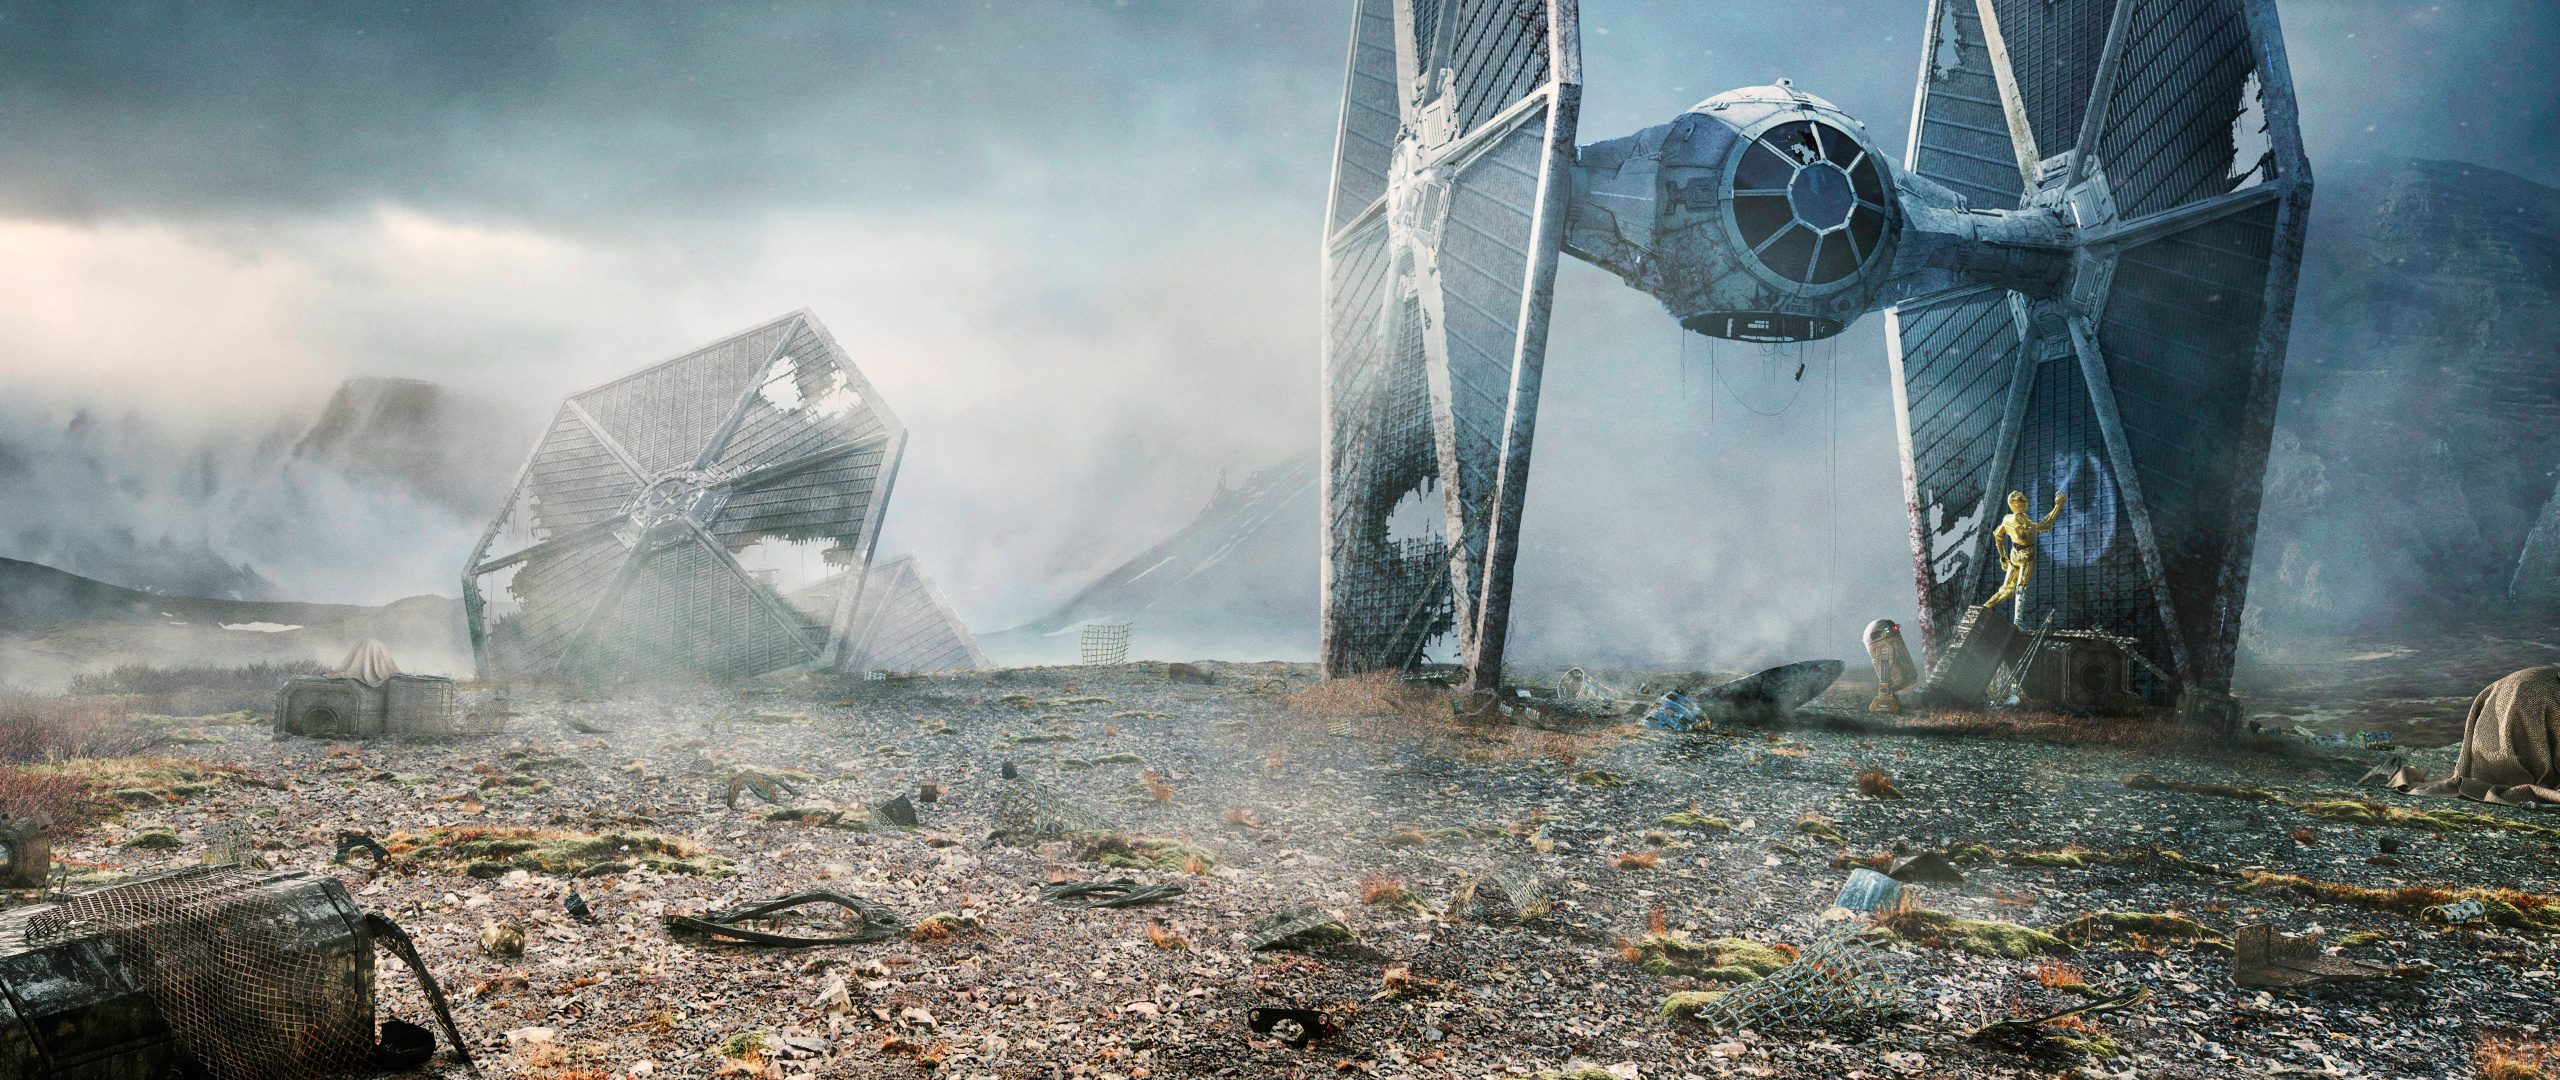 Download Tie Fighter Star Wars 2560x1080 Resolution HD 8K Wallpaper